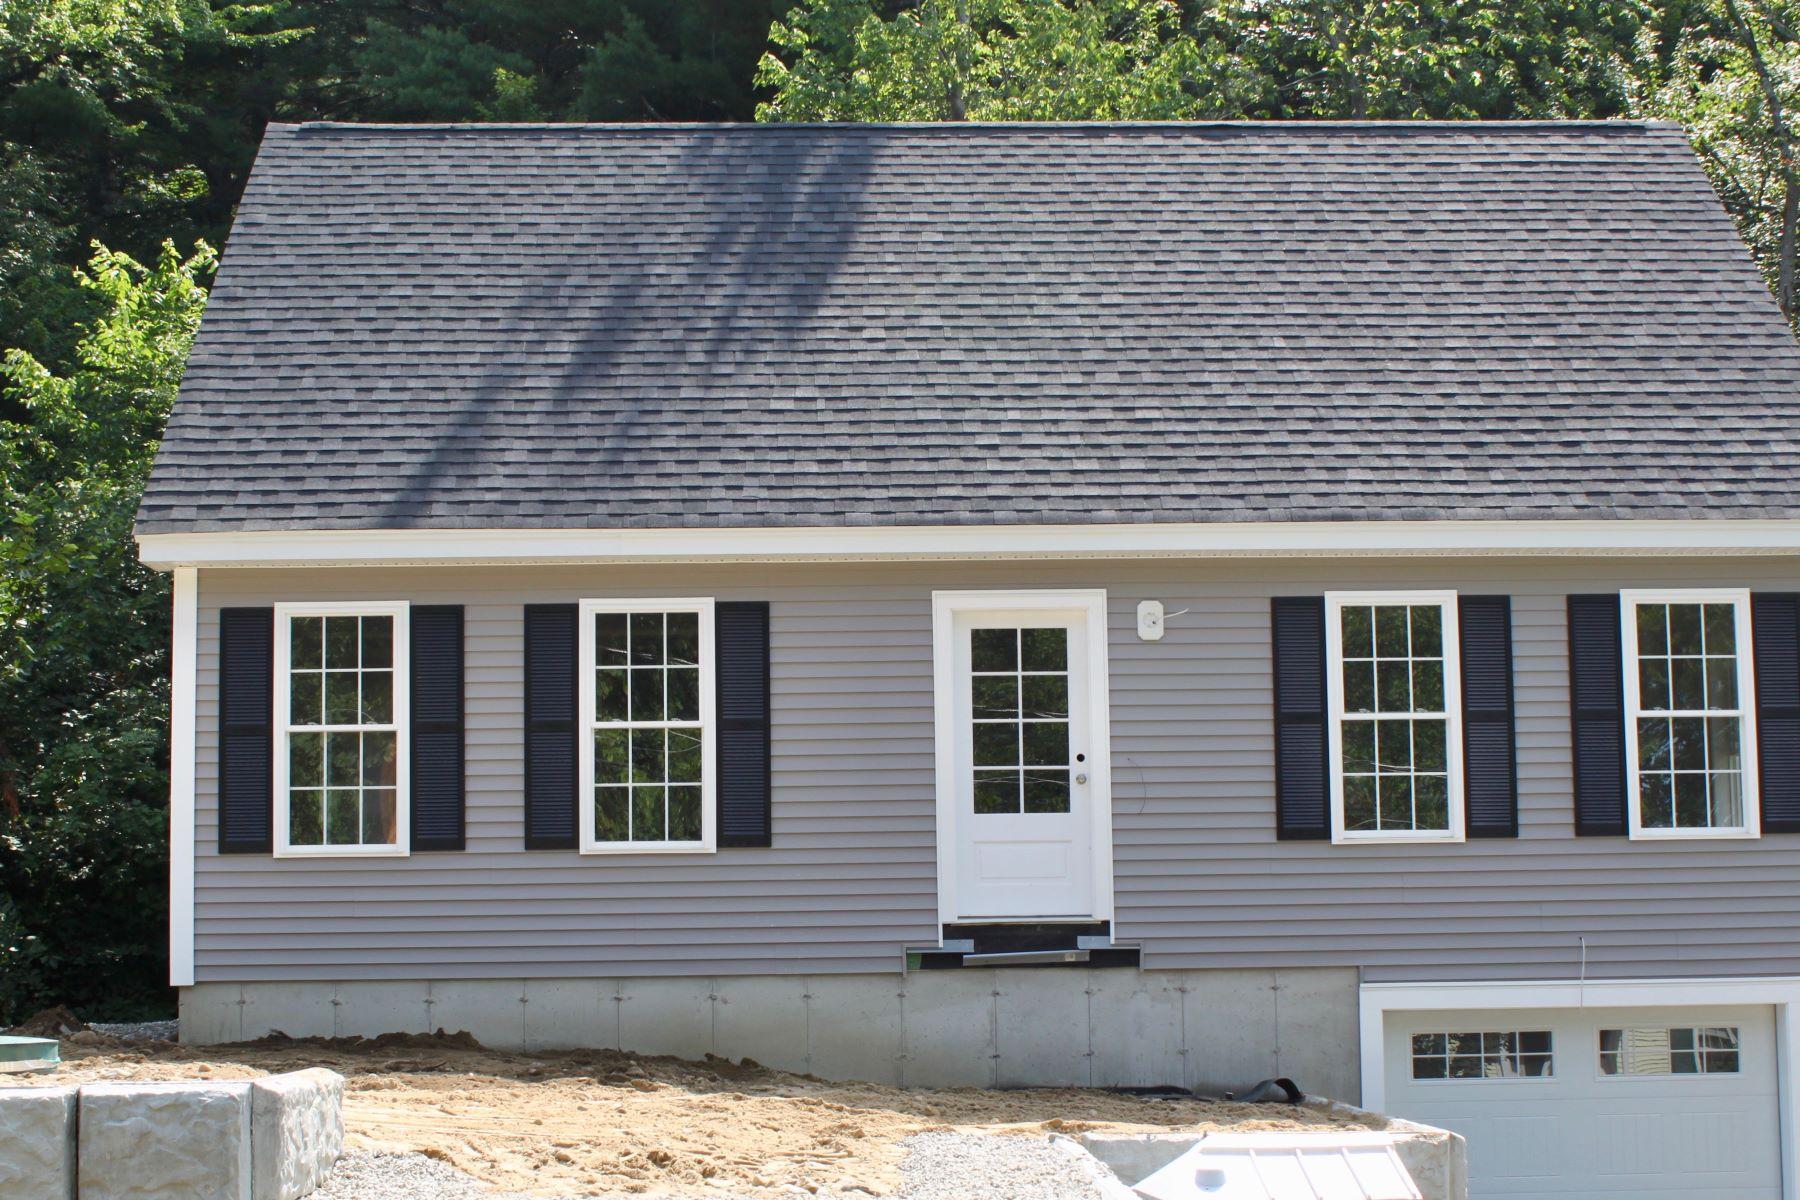 Single Family Homes for Sale at New Construction - Custom Built Cape 54 Maple Parkway Lunenburg, Massachusetts 01462 United States